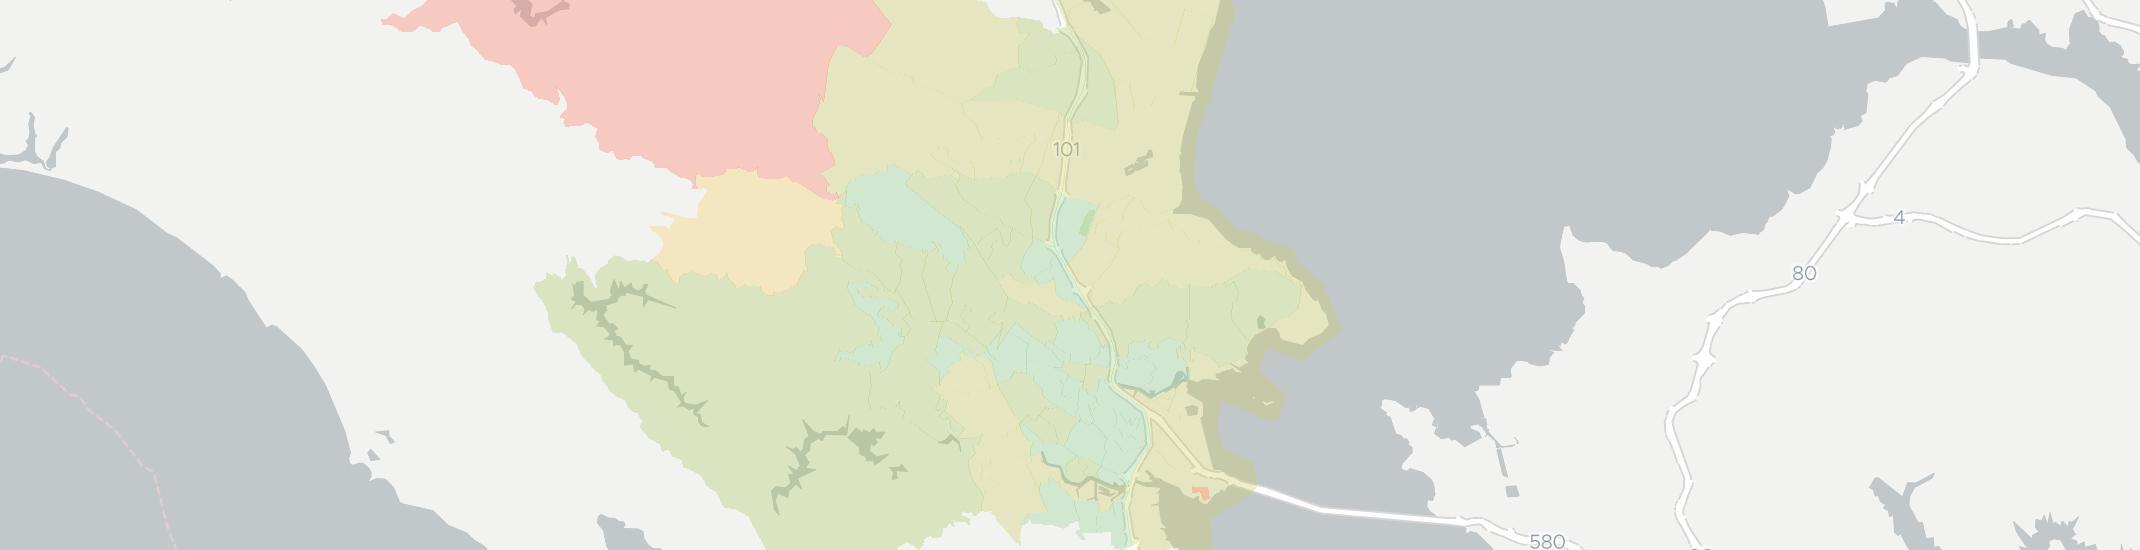 San Rafael Ca Has 22 Internet Service Providers Broadbandnow Com